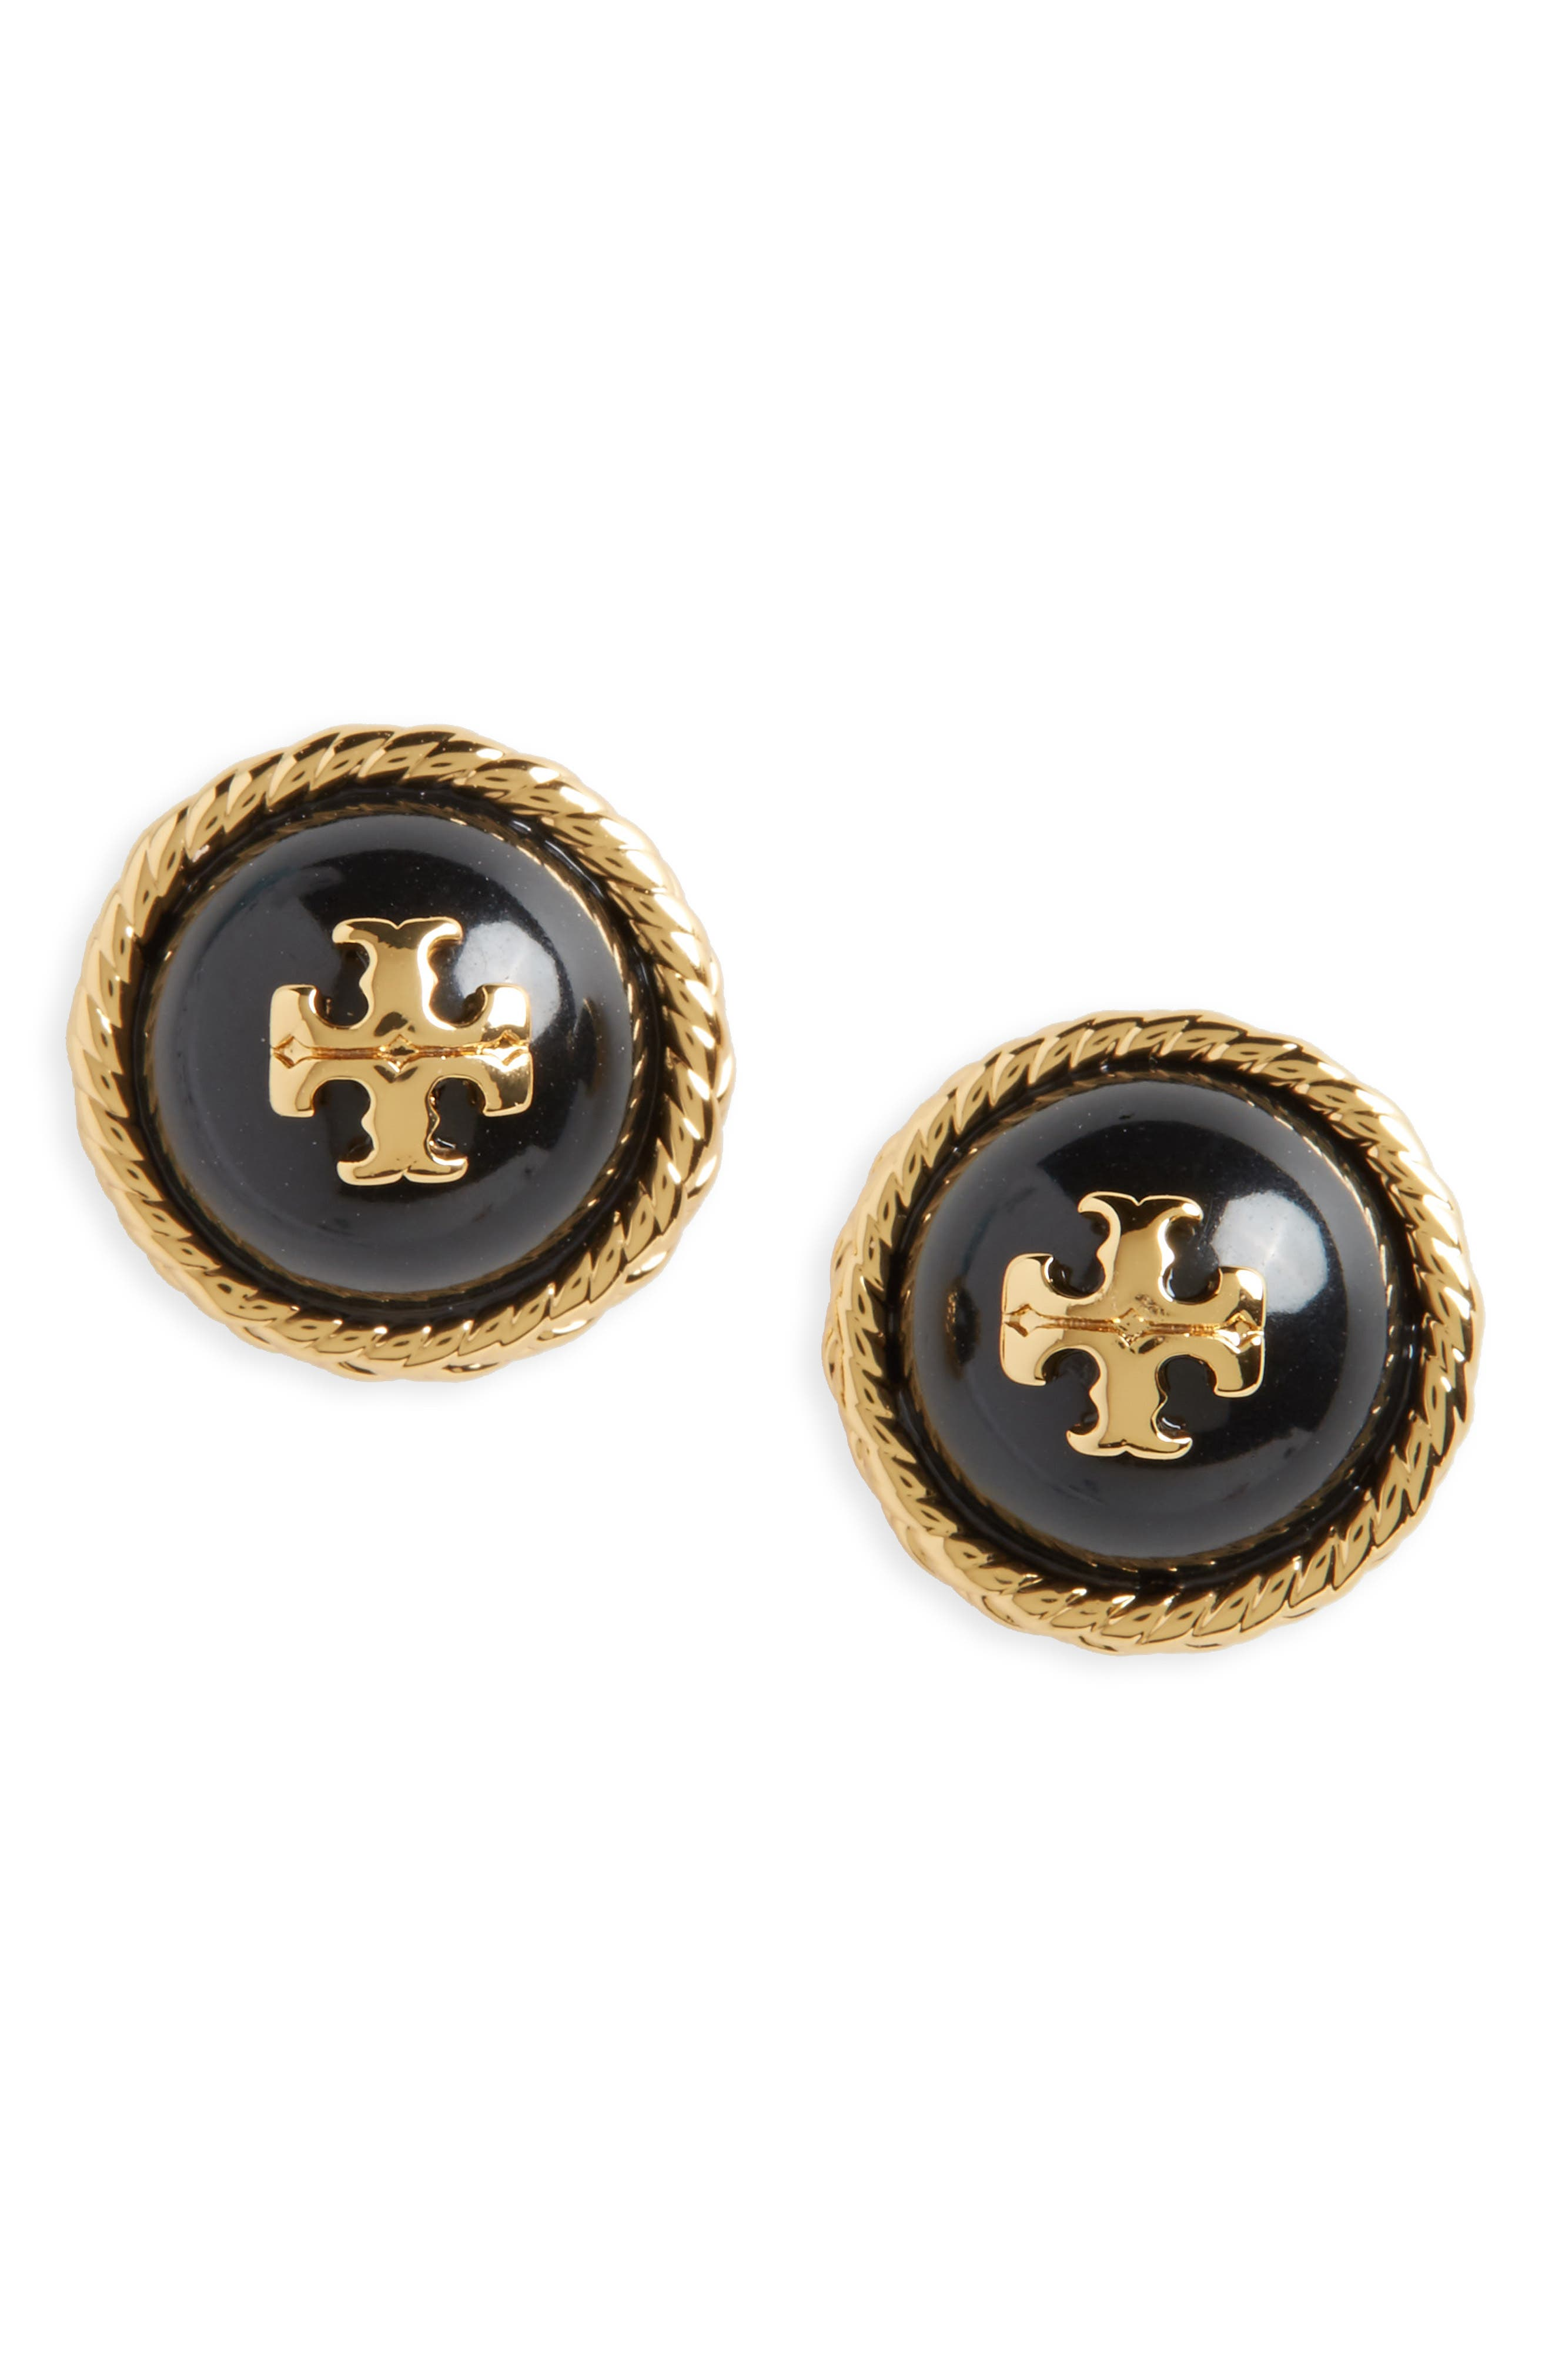 Rope Stud Earrings,                         Main,                         color, Black / Tory Gold